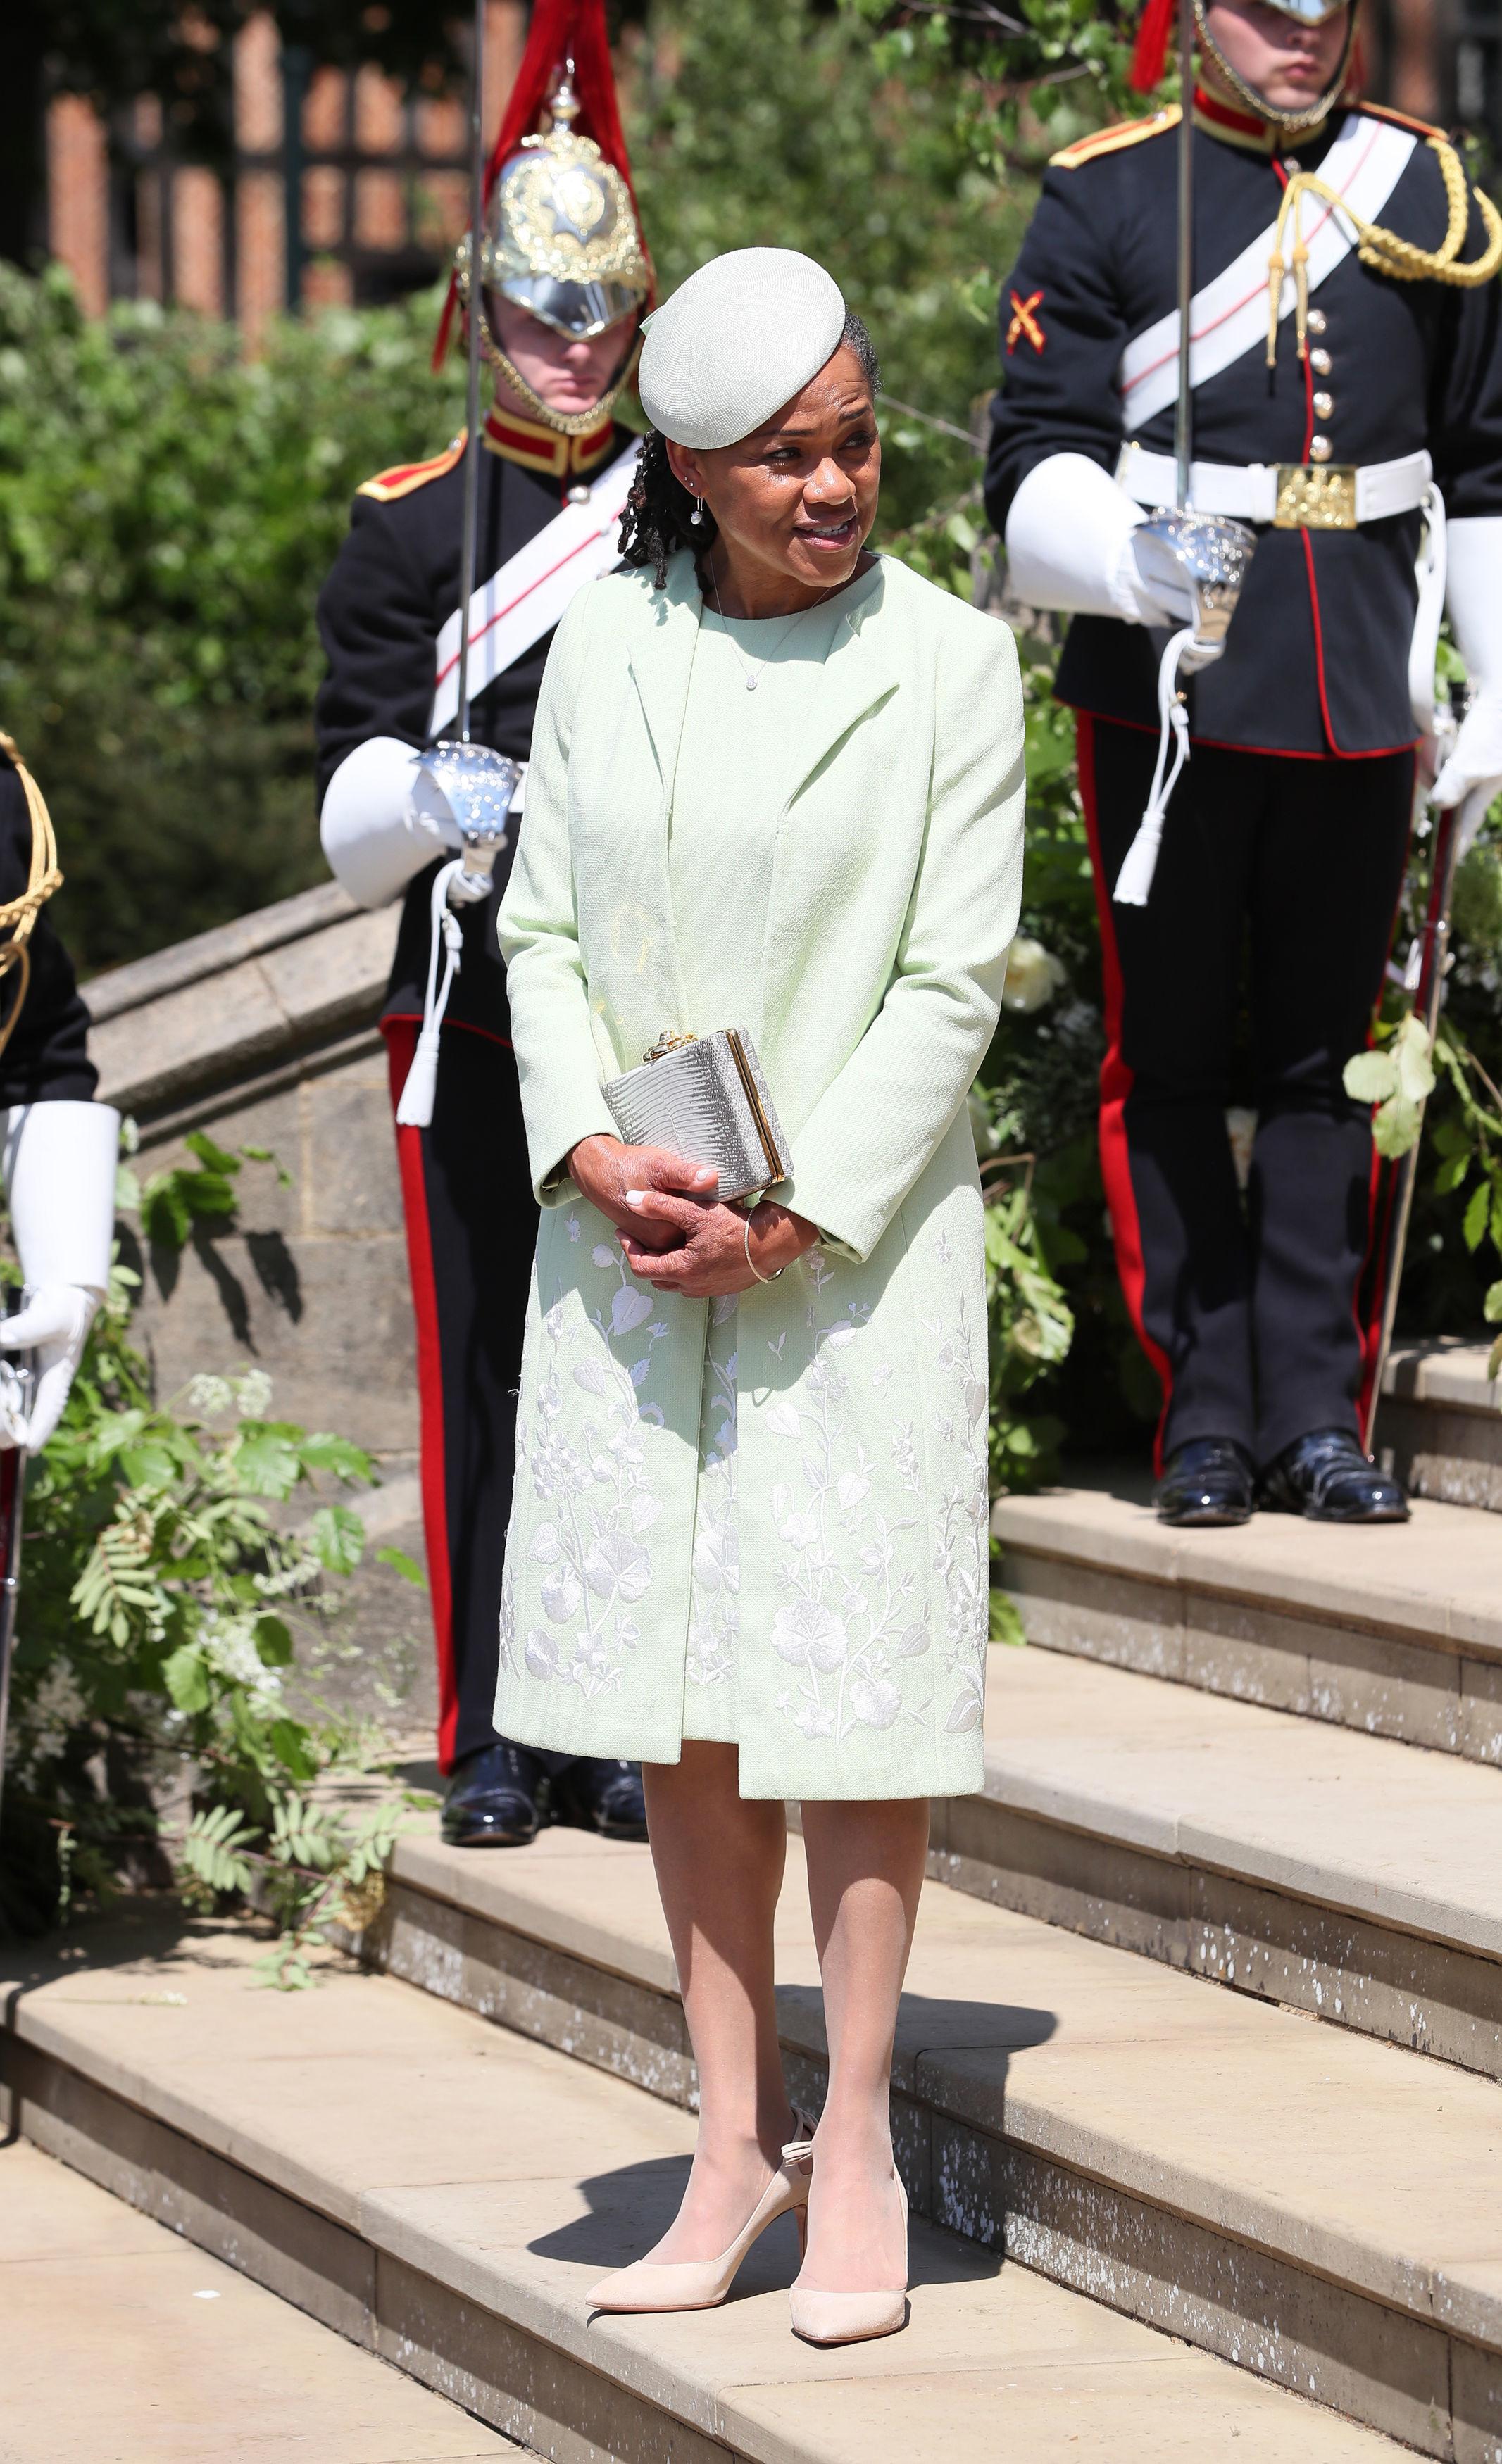 Doria Ragland outfit royal wedding 2018